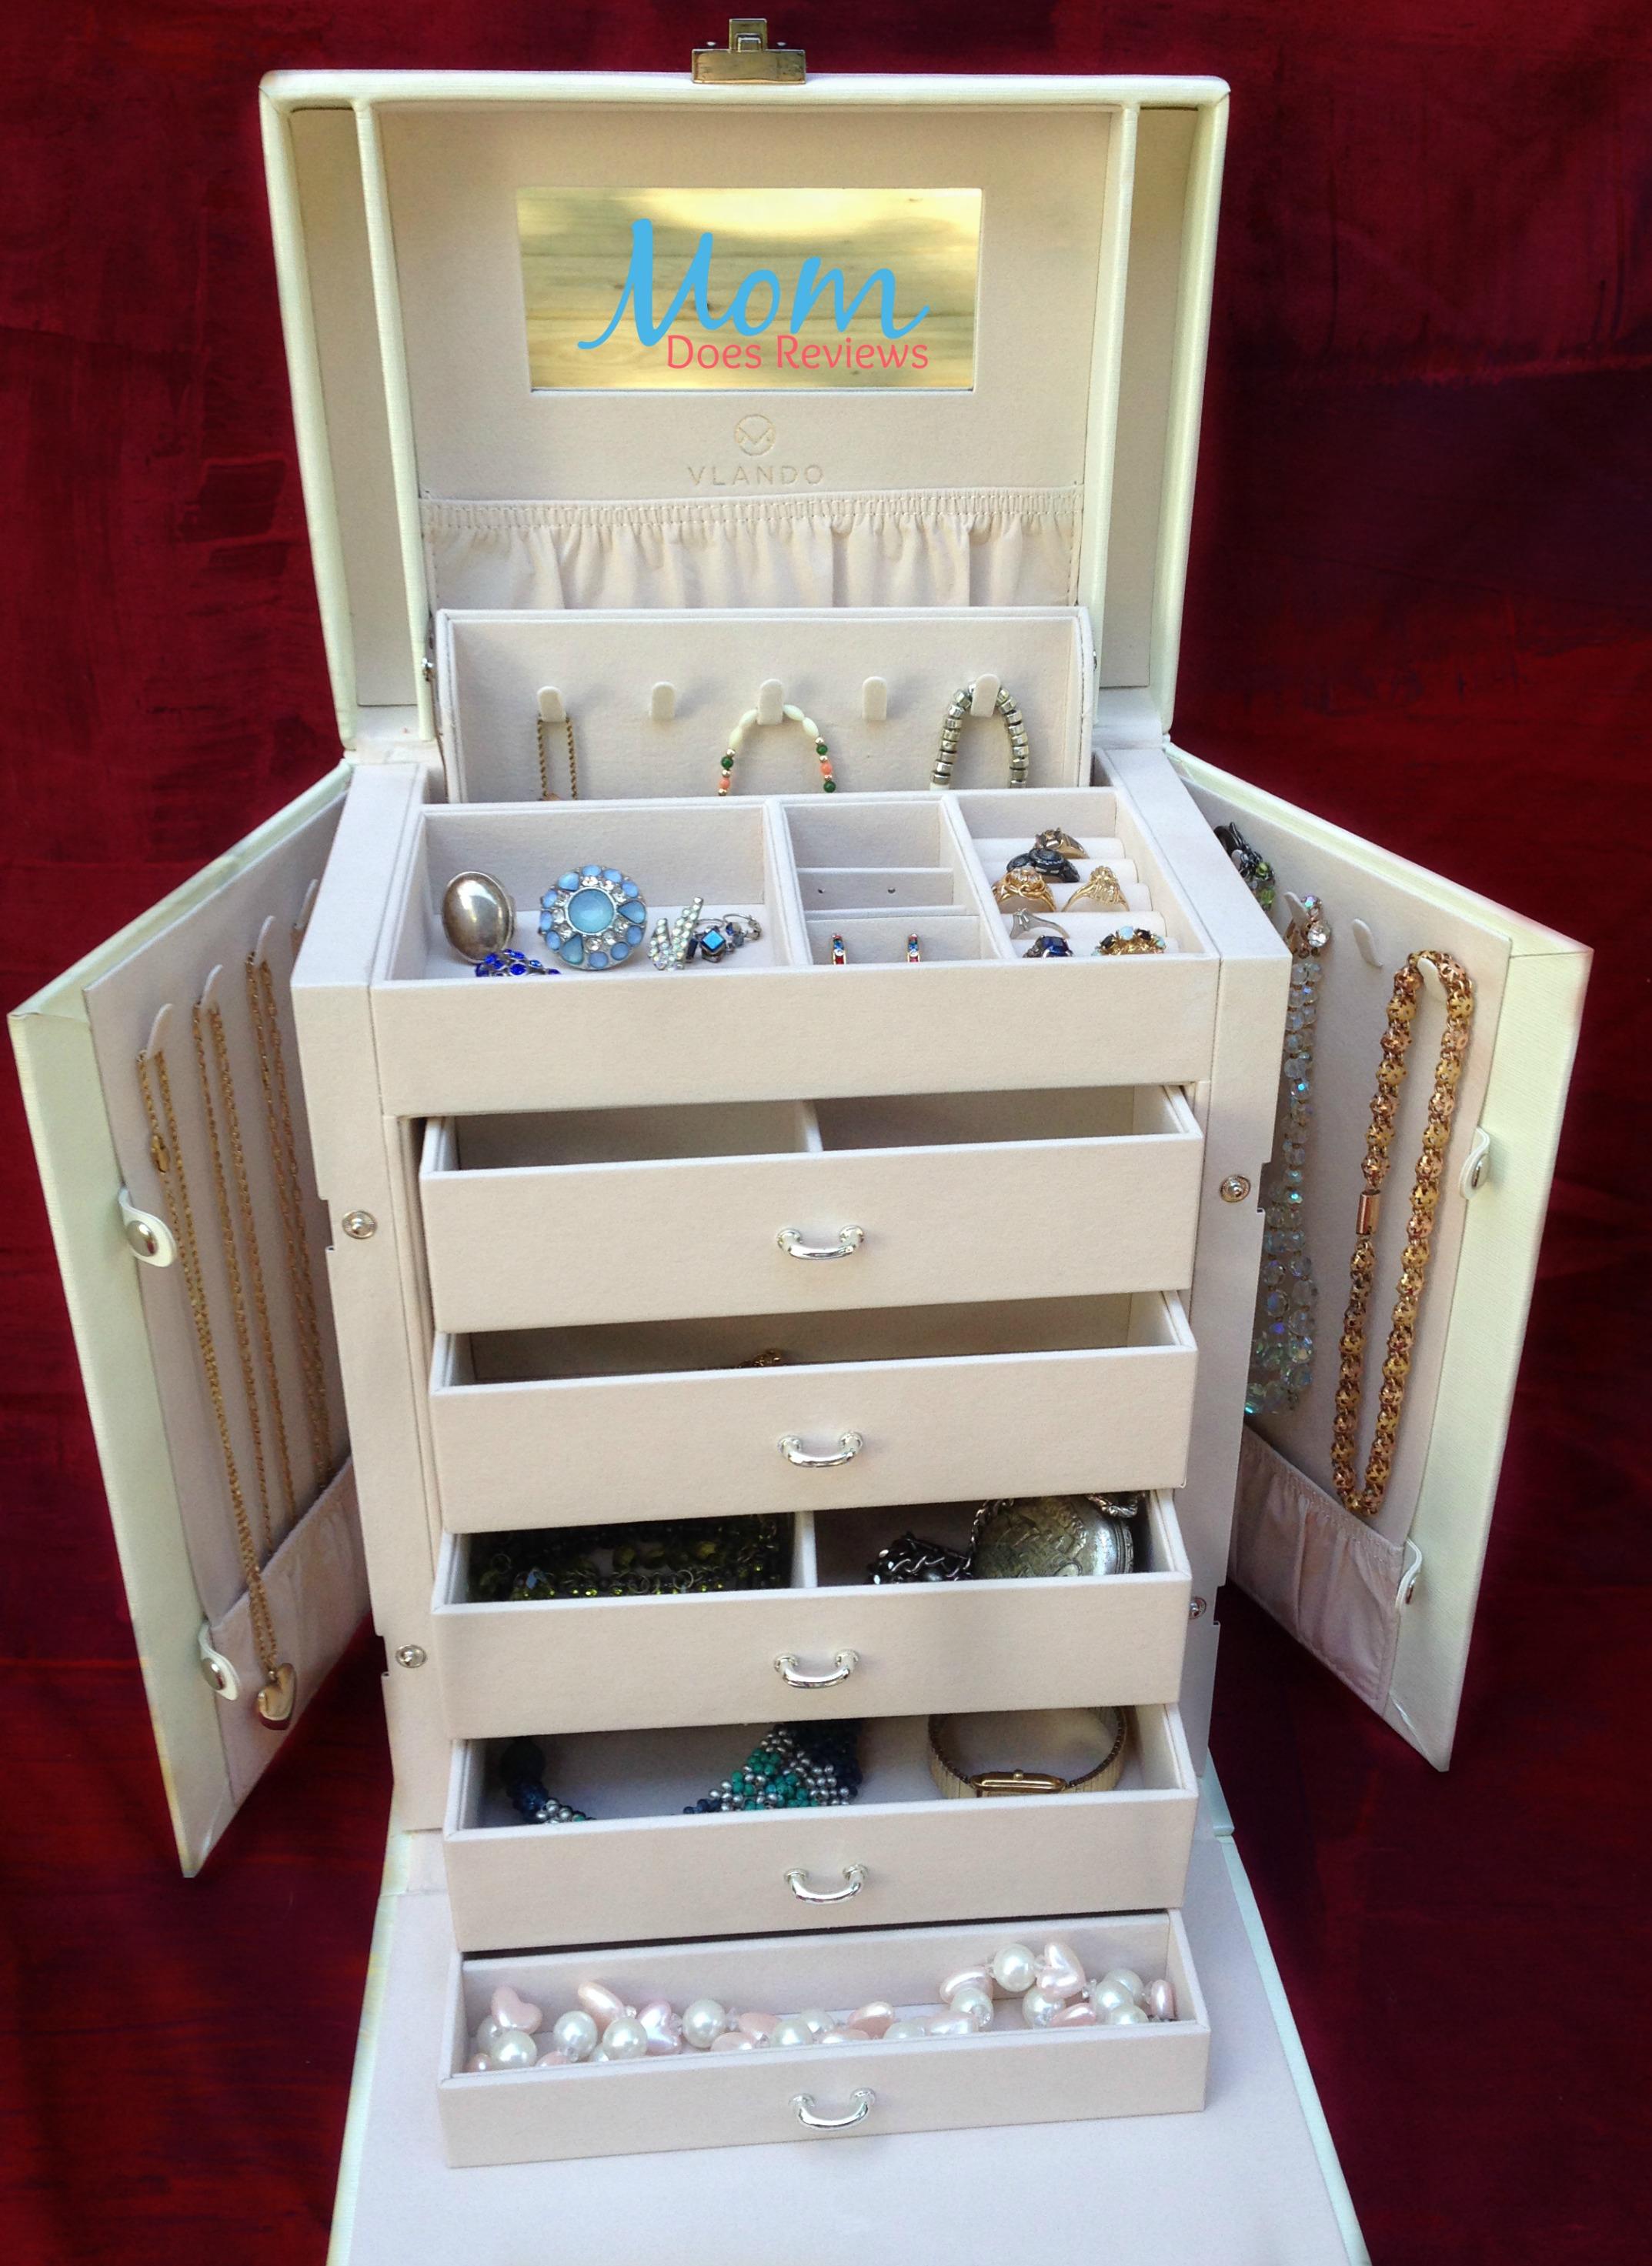 Vlando, The Jewelry Box Every Woman Needs! #Review